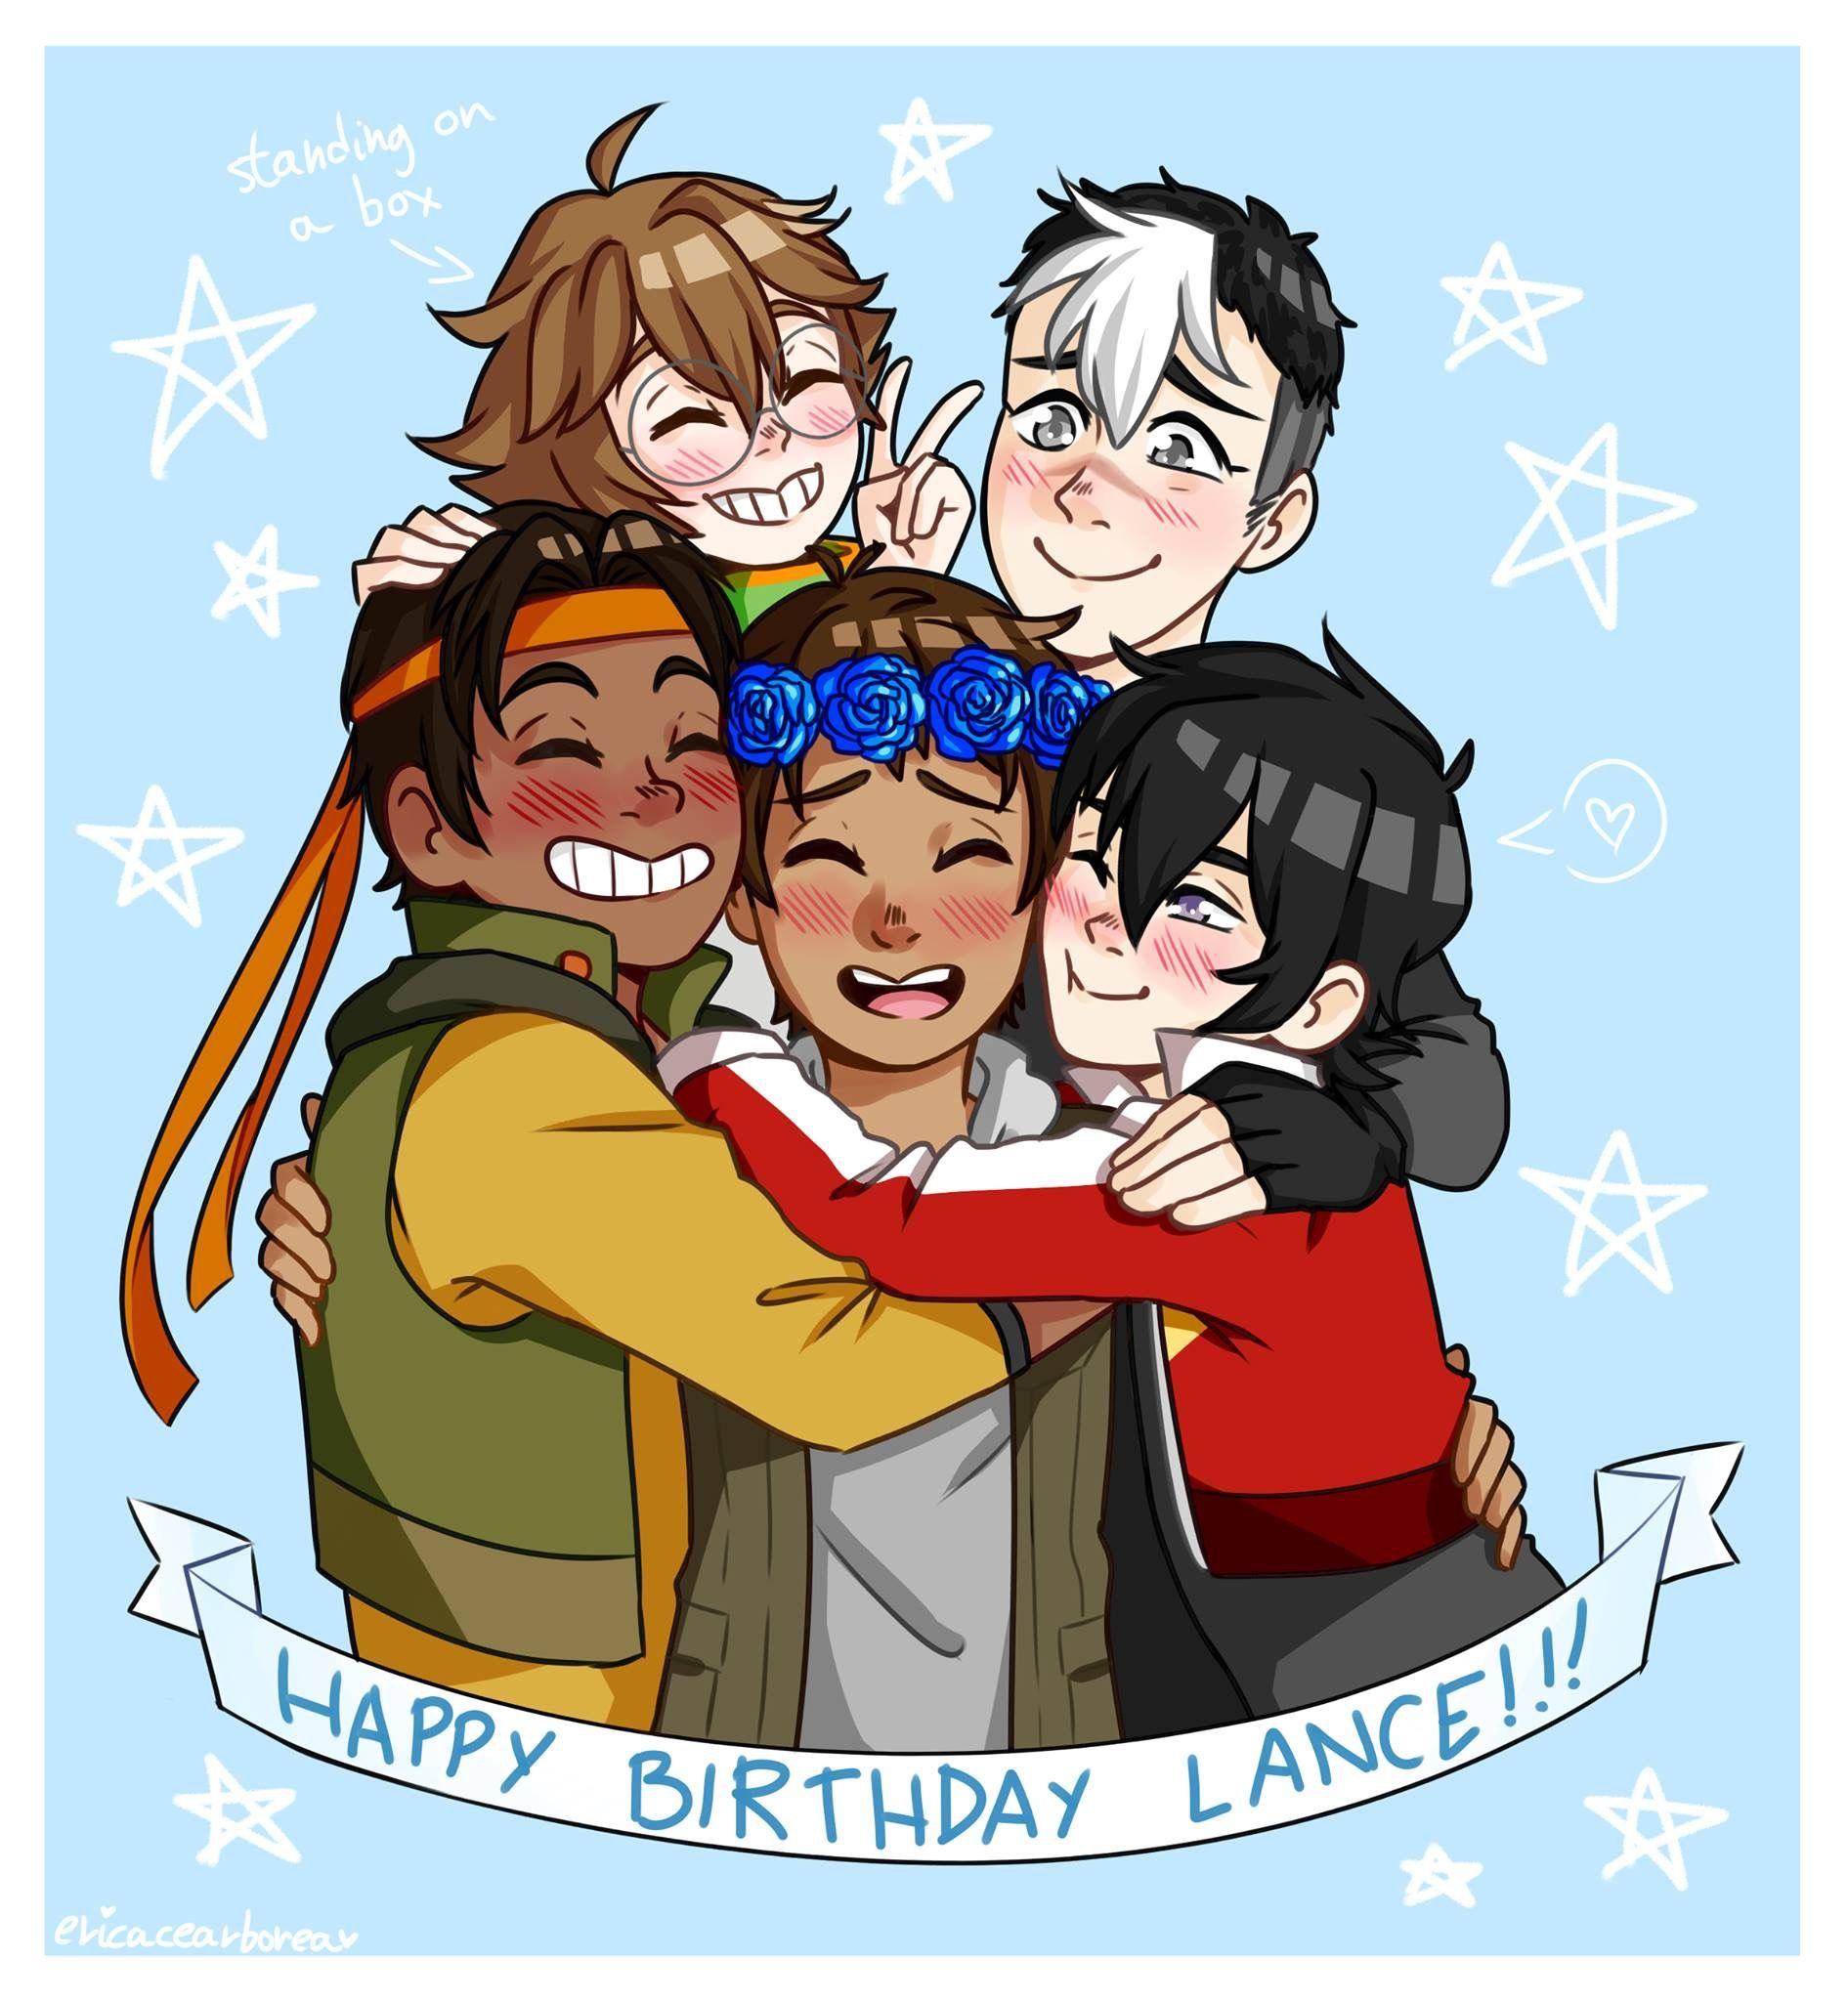 lance mcclain birthday July 28th!! HAPPY BIRTHDAY LANCE!! | Voltron?? | Pinterest  lance mcclain birthday